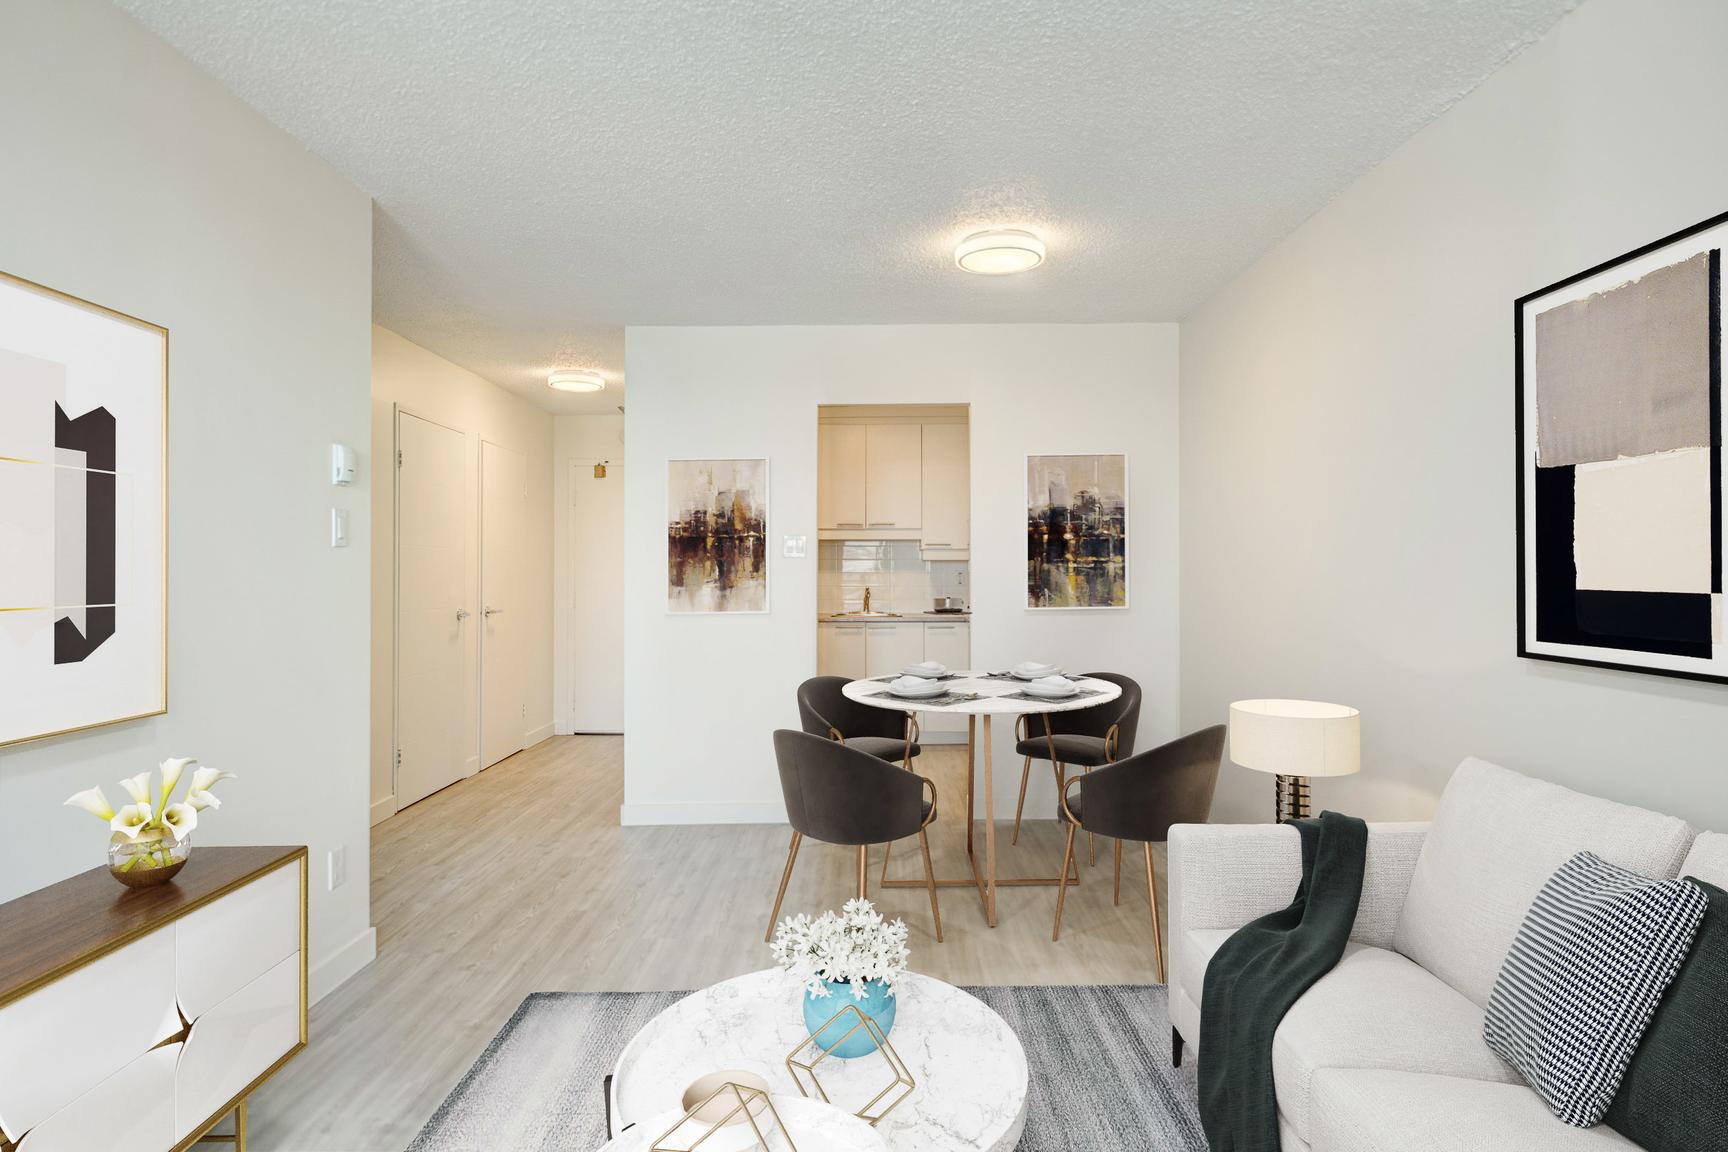 1 bedroom Apartments for rent in Laval at Le Quatre Cent - Photo 01 - RentersPages – L407184